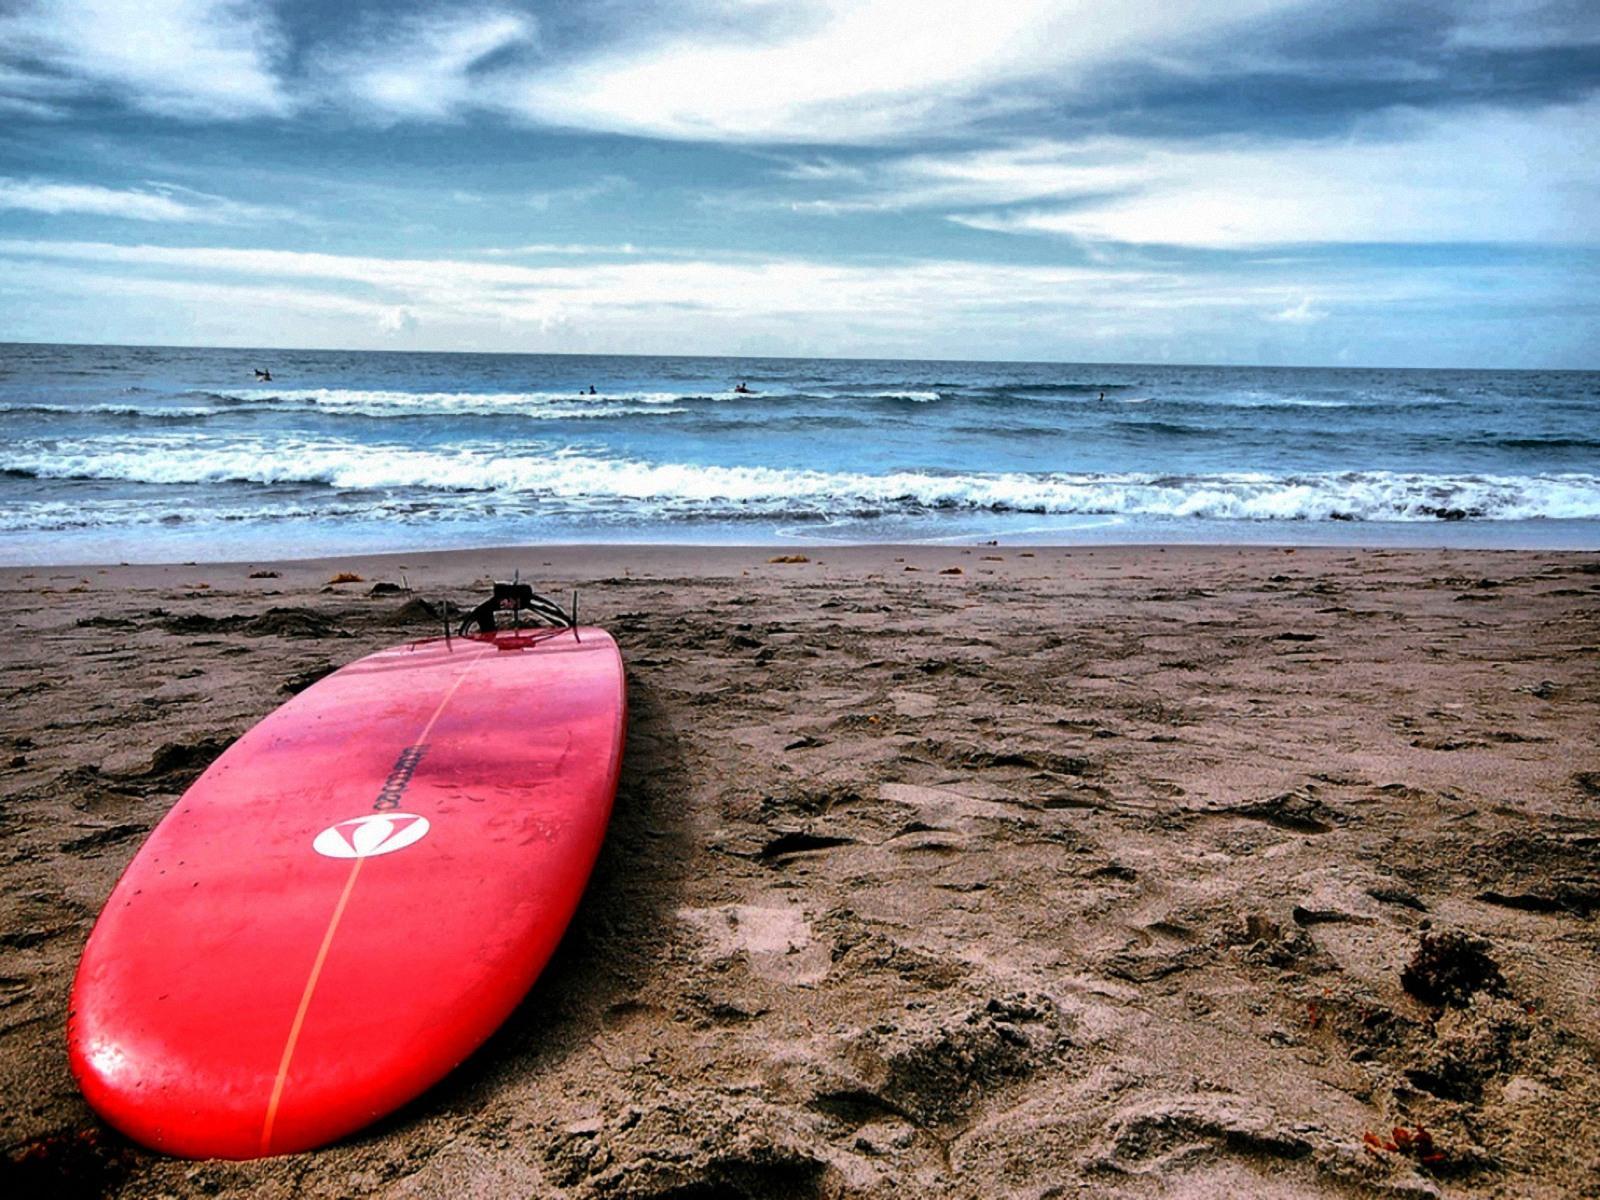 Iphone X Sand Wallpaper Surf Beach Images Free Download Pixelstalk Net